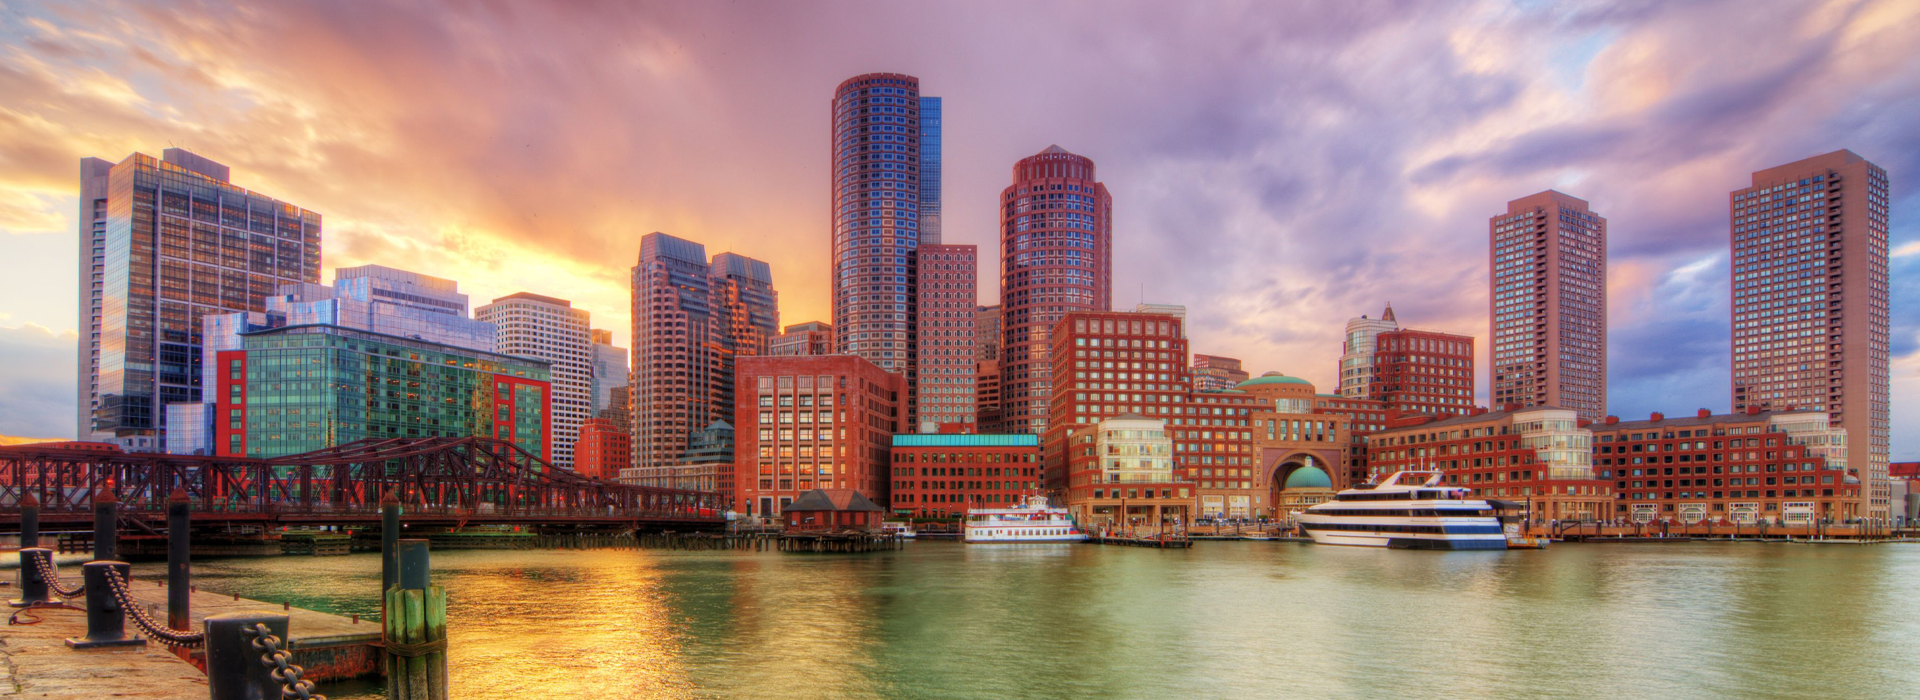 Boston 1920 x 700